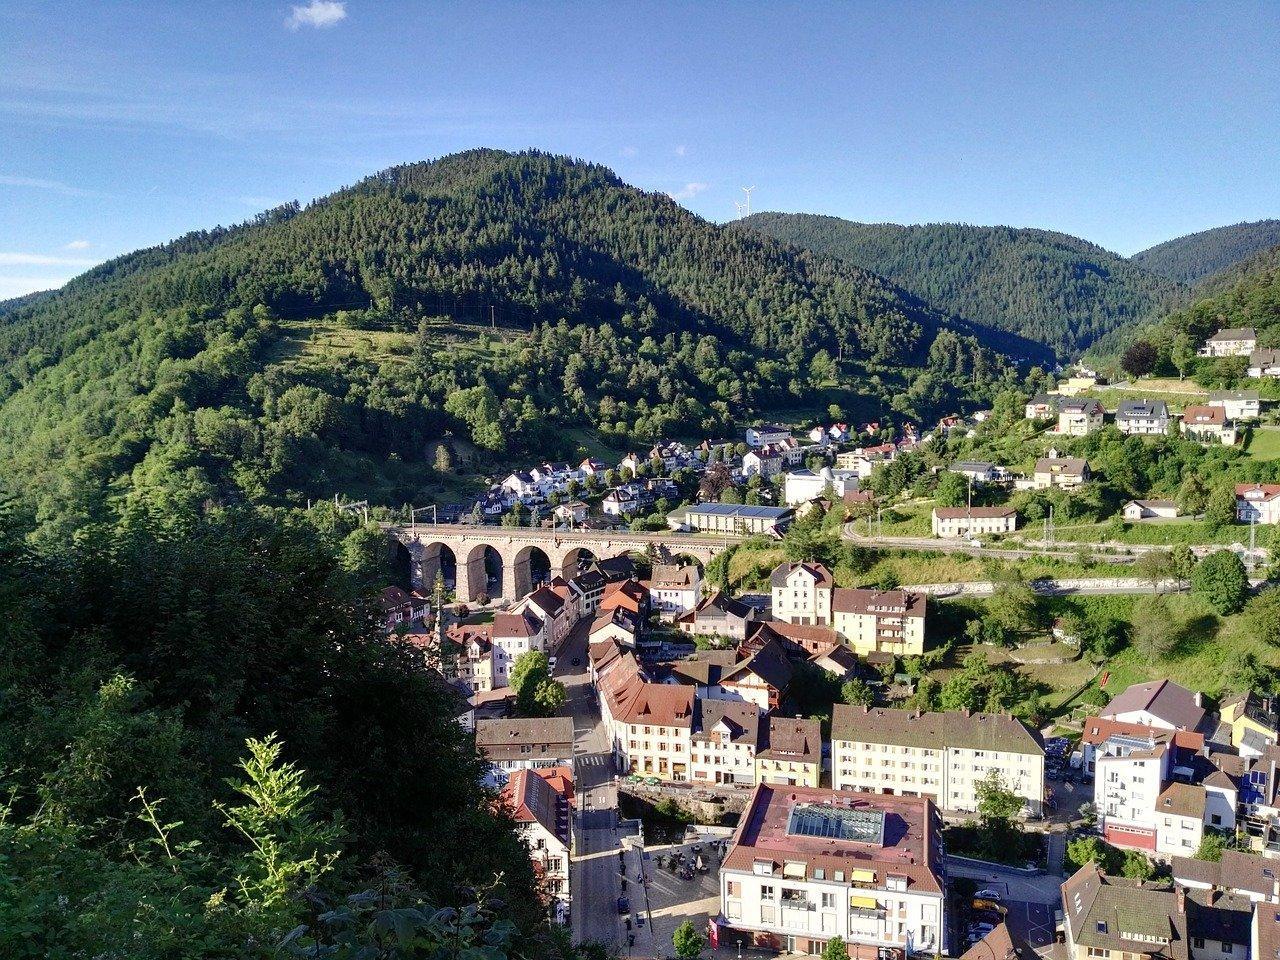 Hornberg, Alemanha